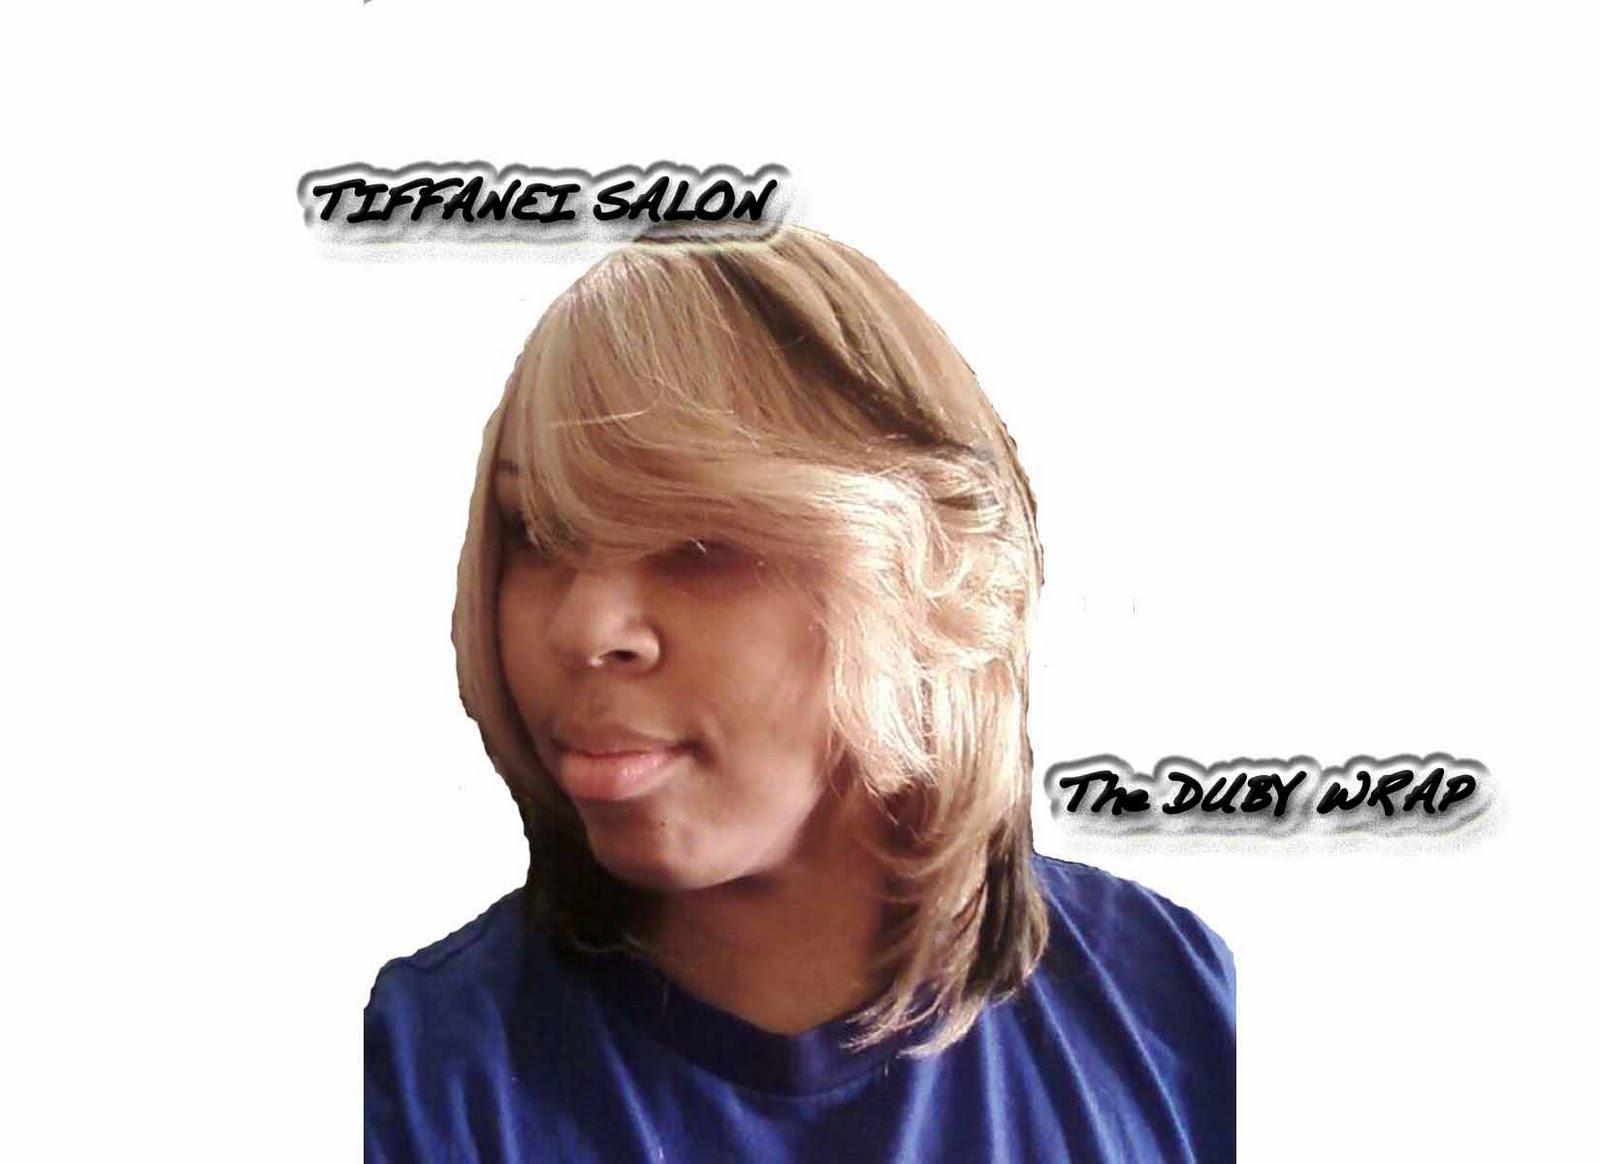 Duby Hair Weave Styles: Briads & Hair Weaving: THE DUBY WRAP